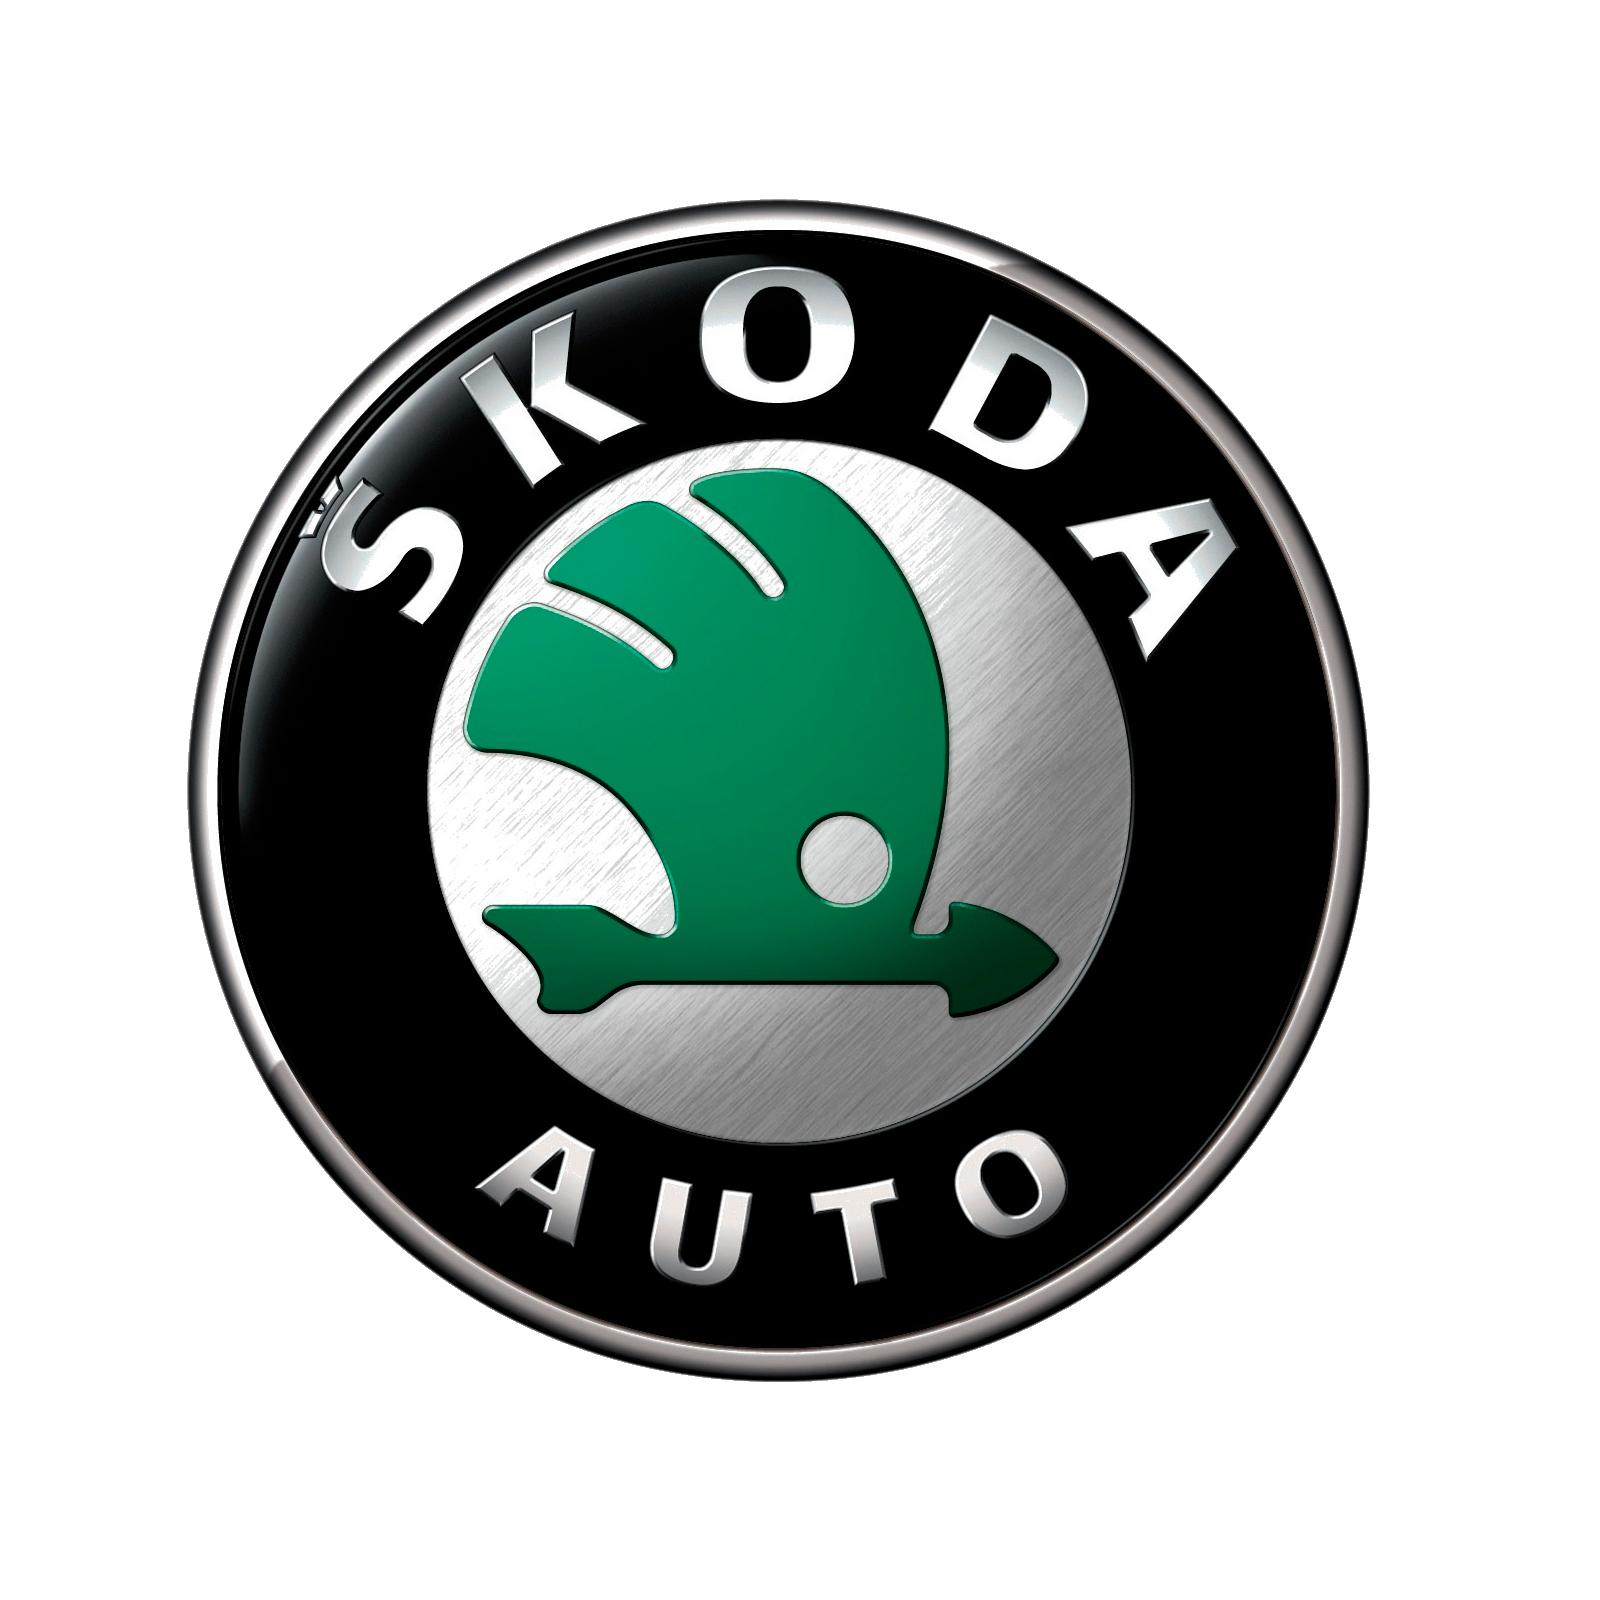 skoda superb iii pdf workshop service repair manual 2016 2018 rh easymanuals co uk skoda octavia service repair workshop manual 2011 skoda superb workshop service & repair manual